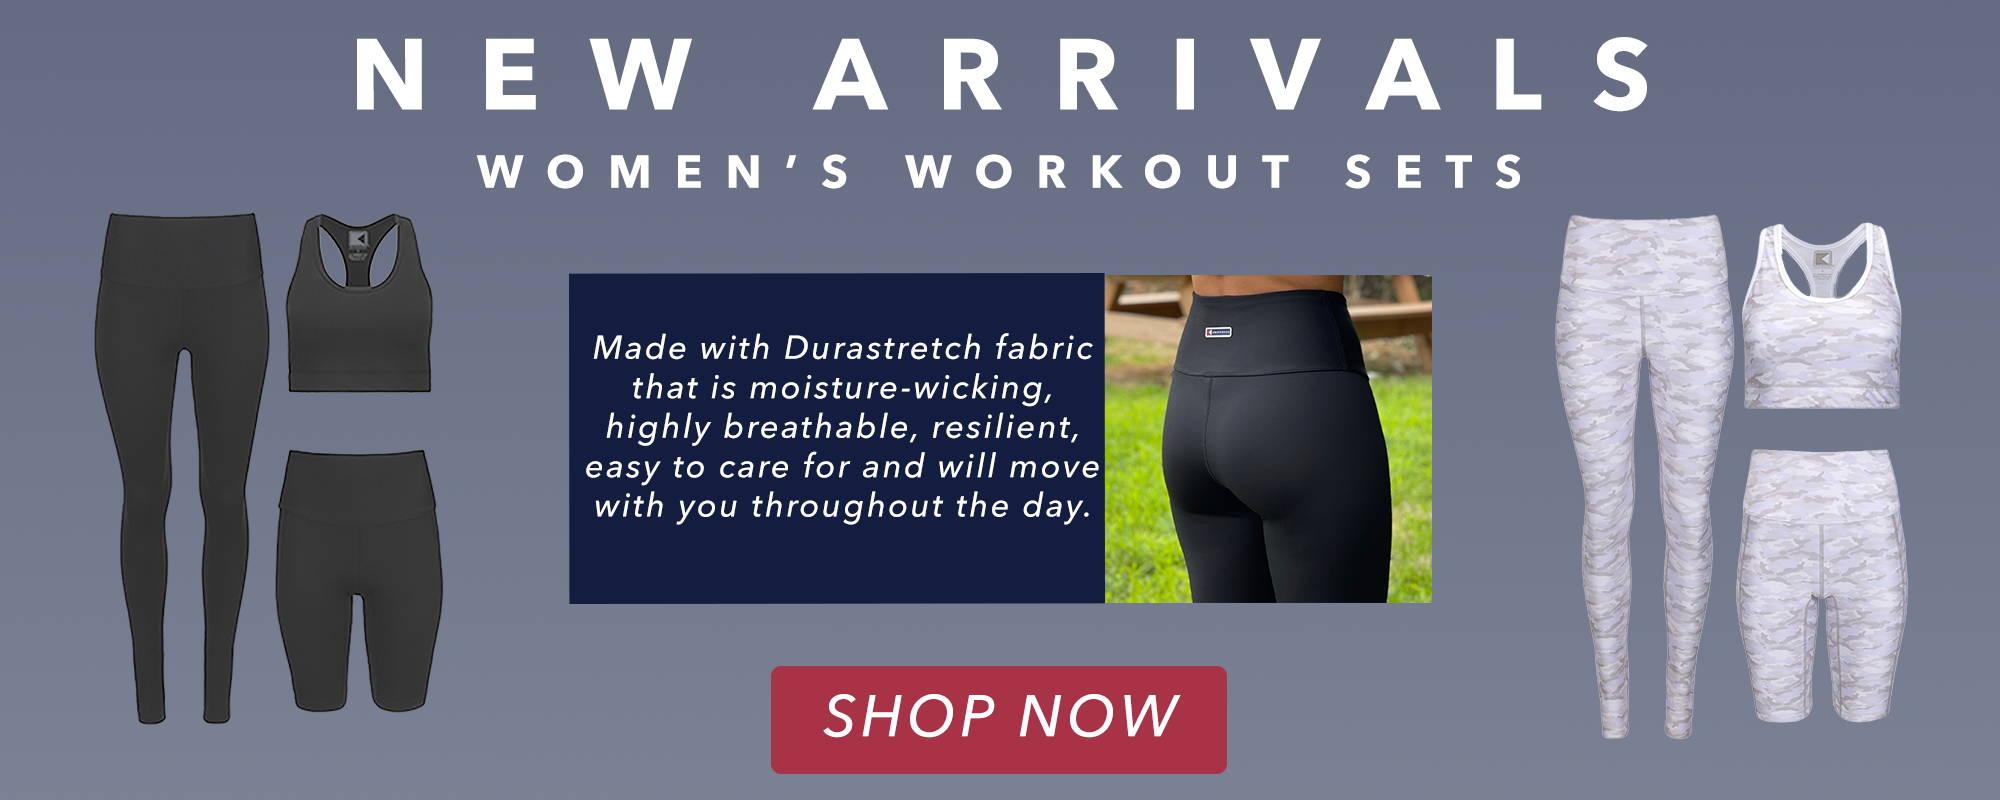 Women's Workout Sets